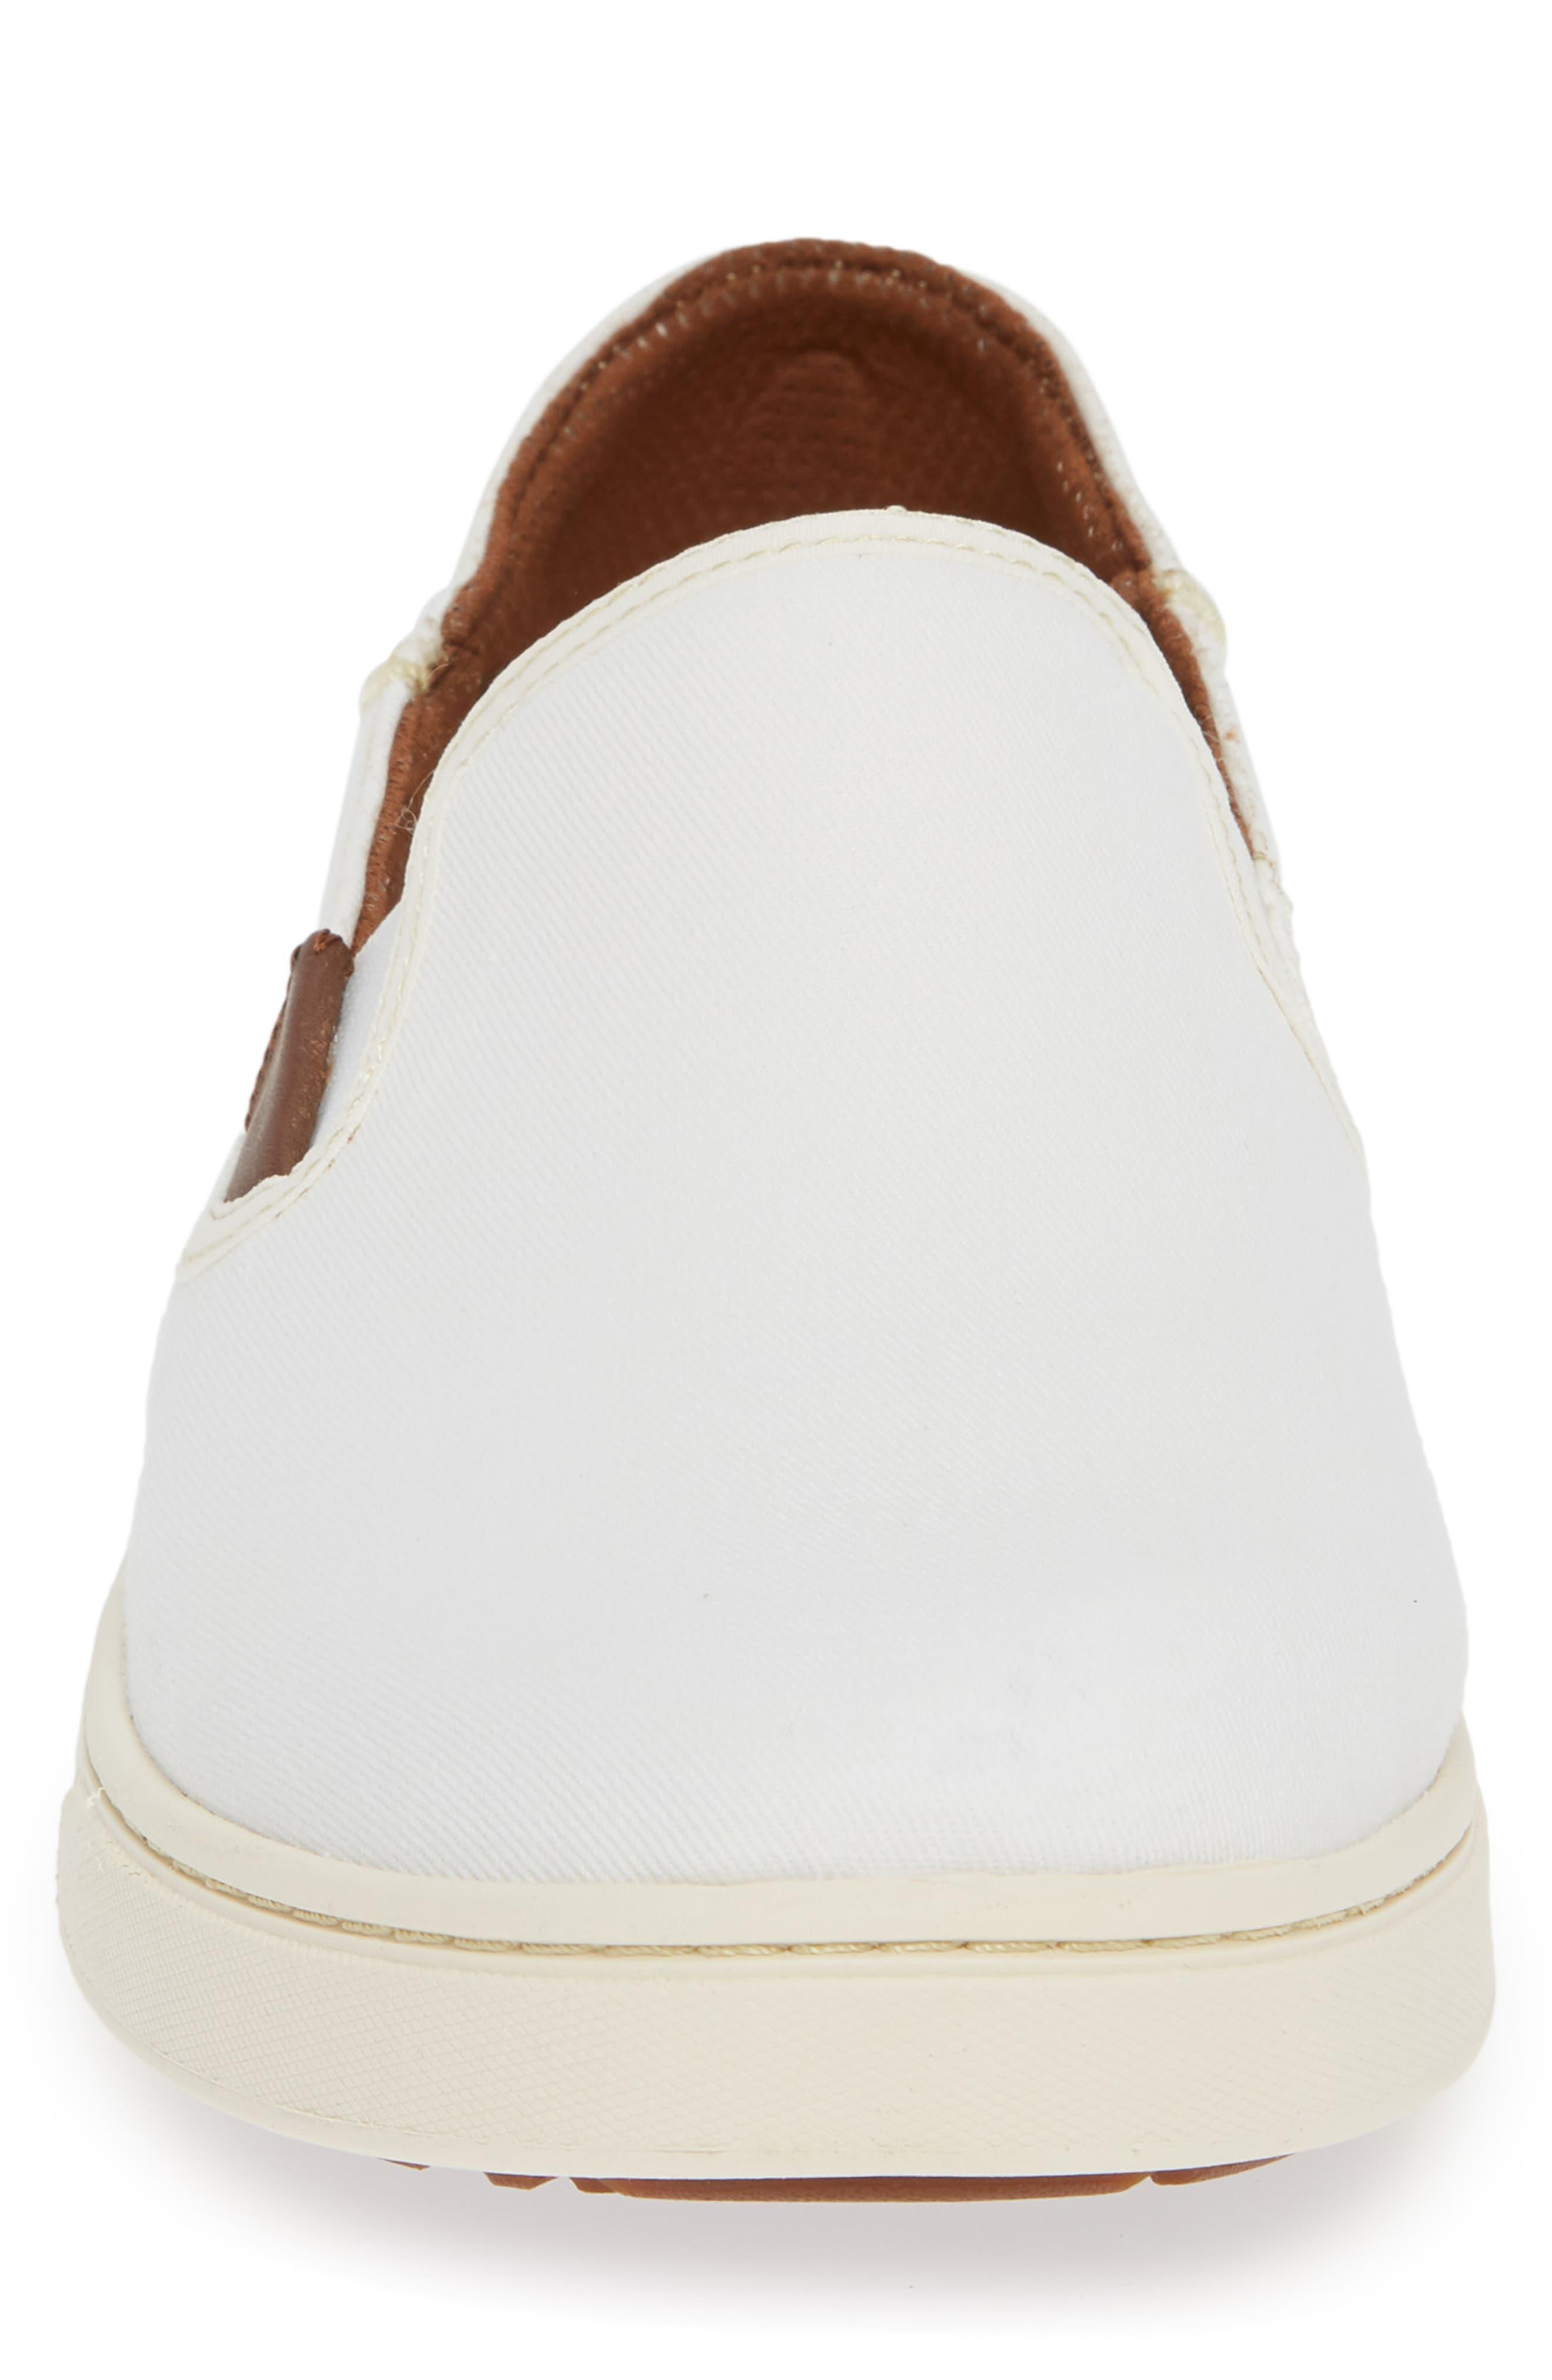 Kahu Collapsible Slip-On Sneaker,                             Alternate thumbnail 4, color,                             259